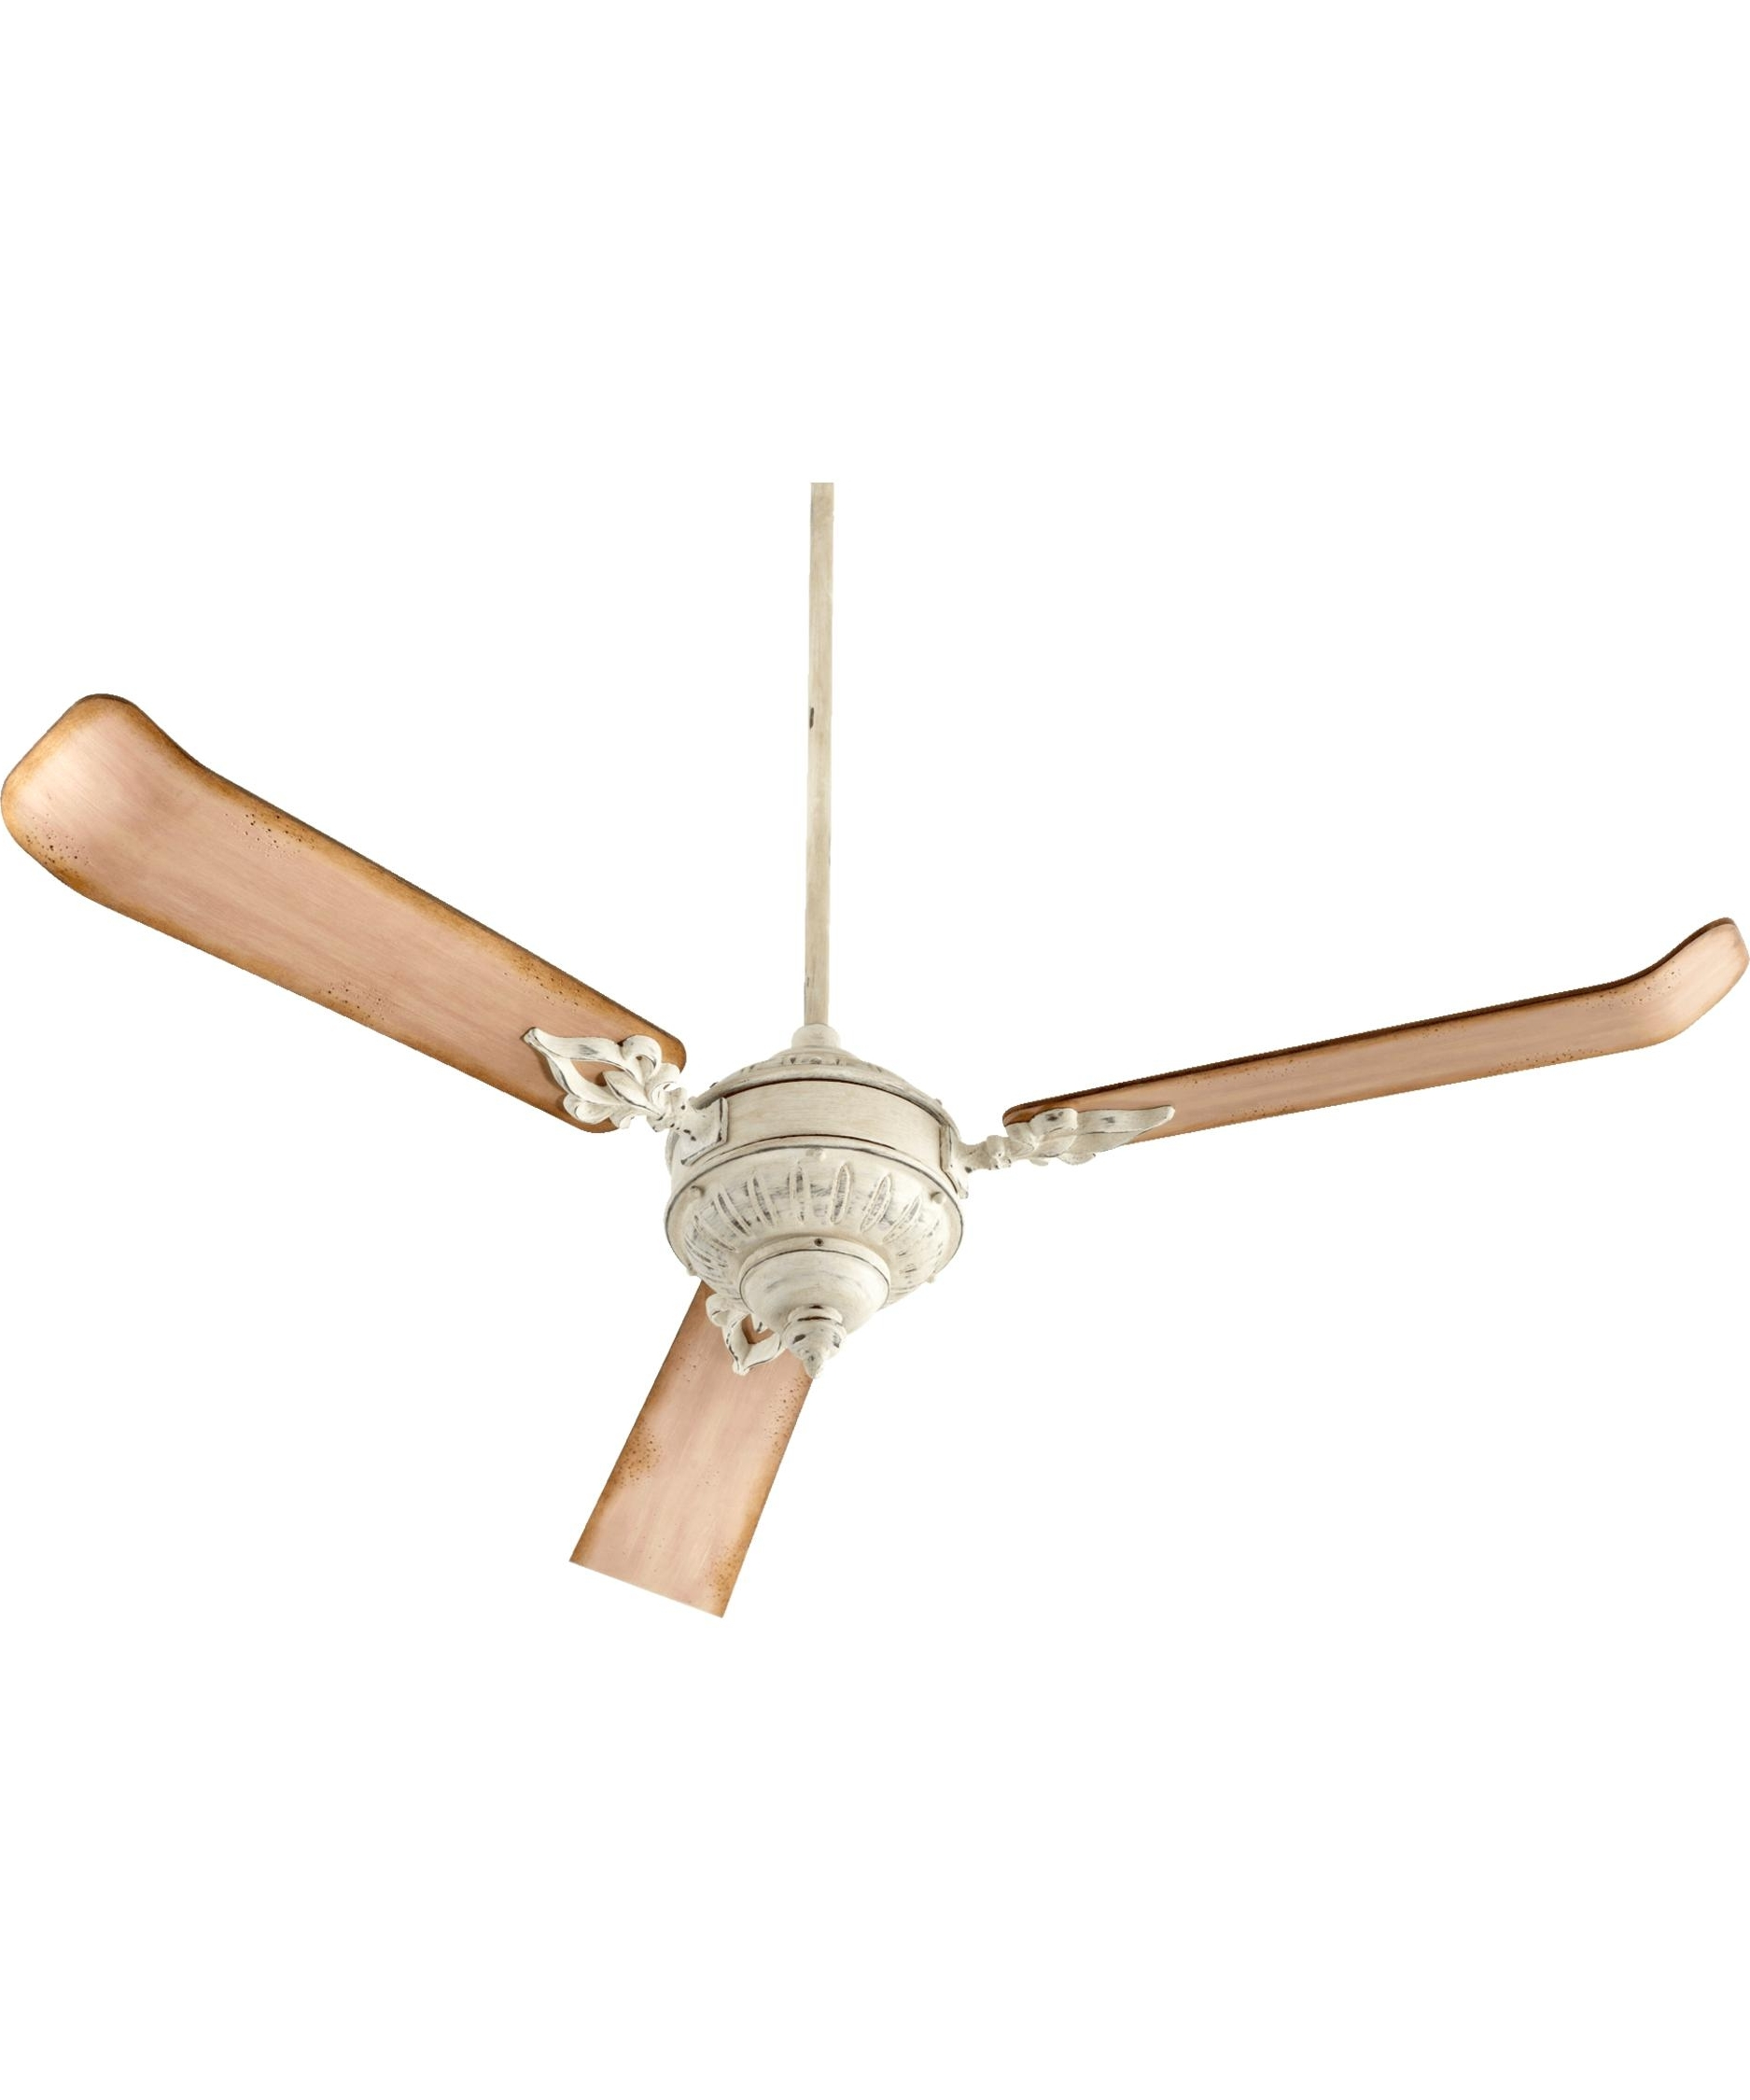 Fashionable Quorum International 27603 Brewster 60 Inch 3 Blade Ceiling Fan Regarding Quorum Outdoor Ceiling Fans (View 5 of 20)